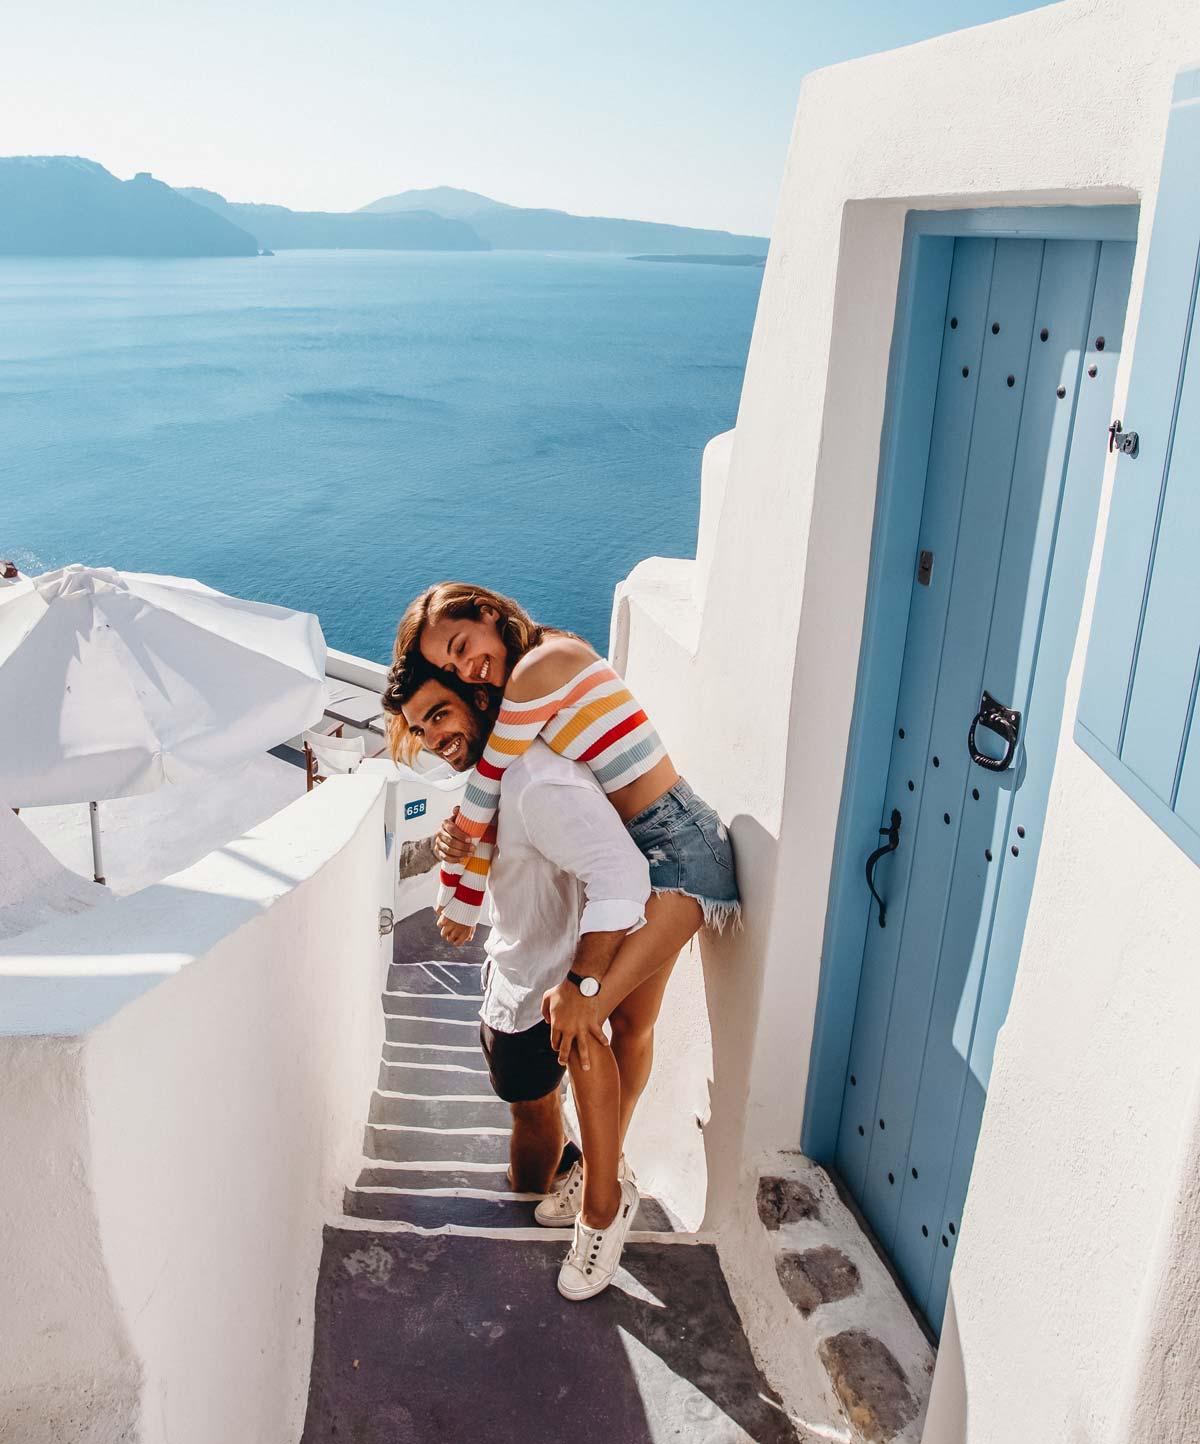 santorini-oia-travel-couple